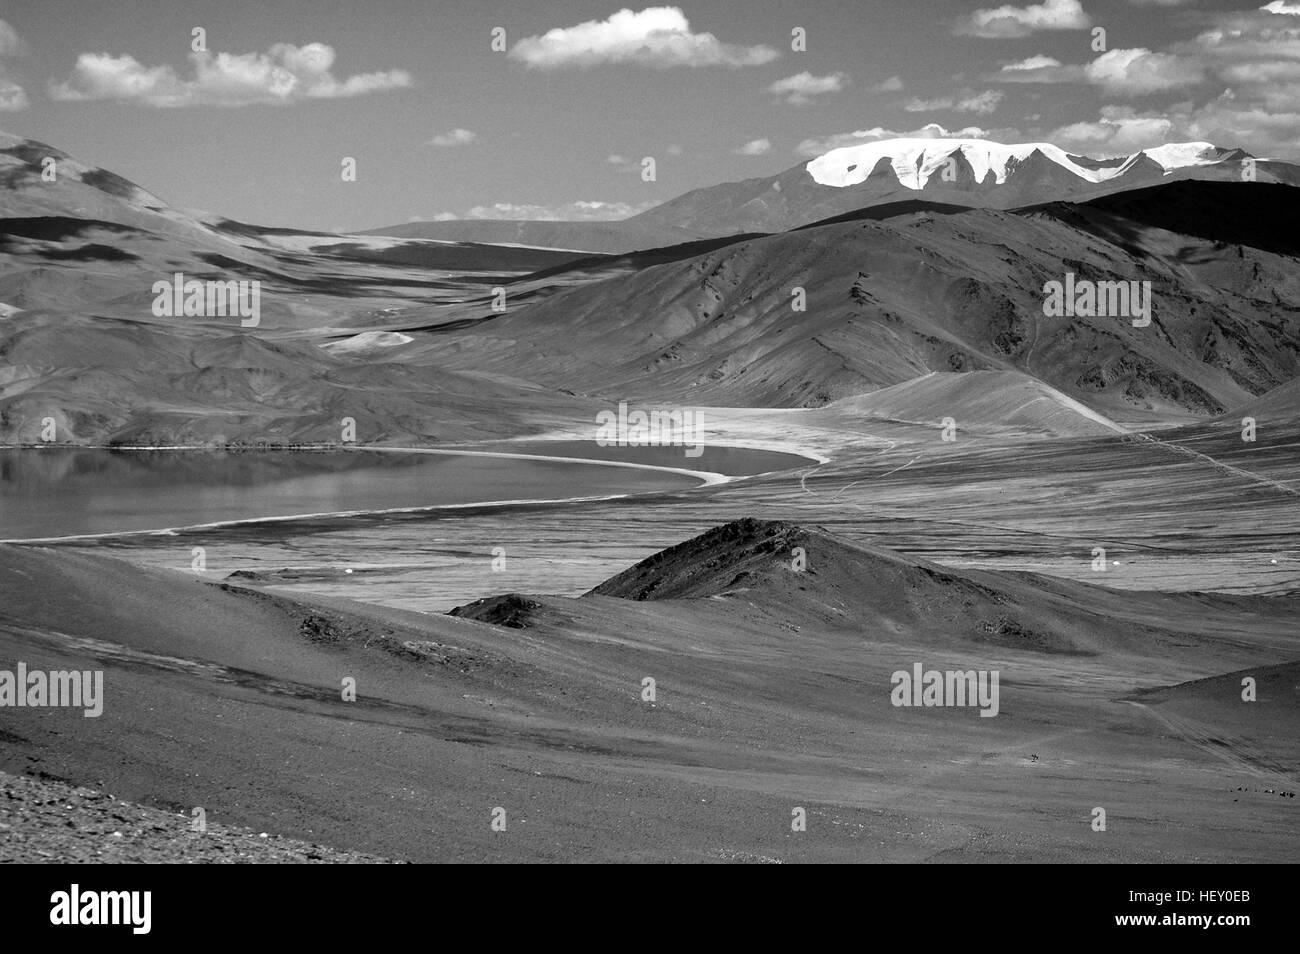 Duruu Lake, Altai Mountains, Bayan-Ulgii, Mongolia - Stock Image